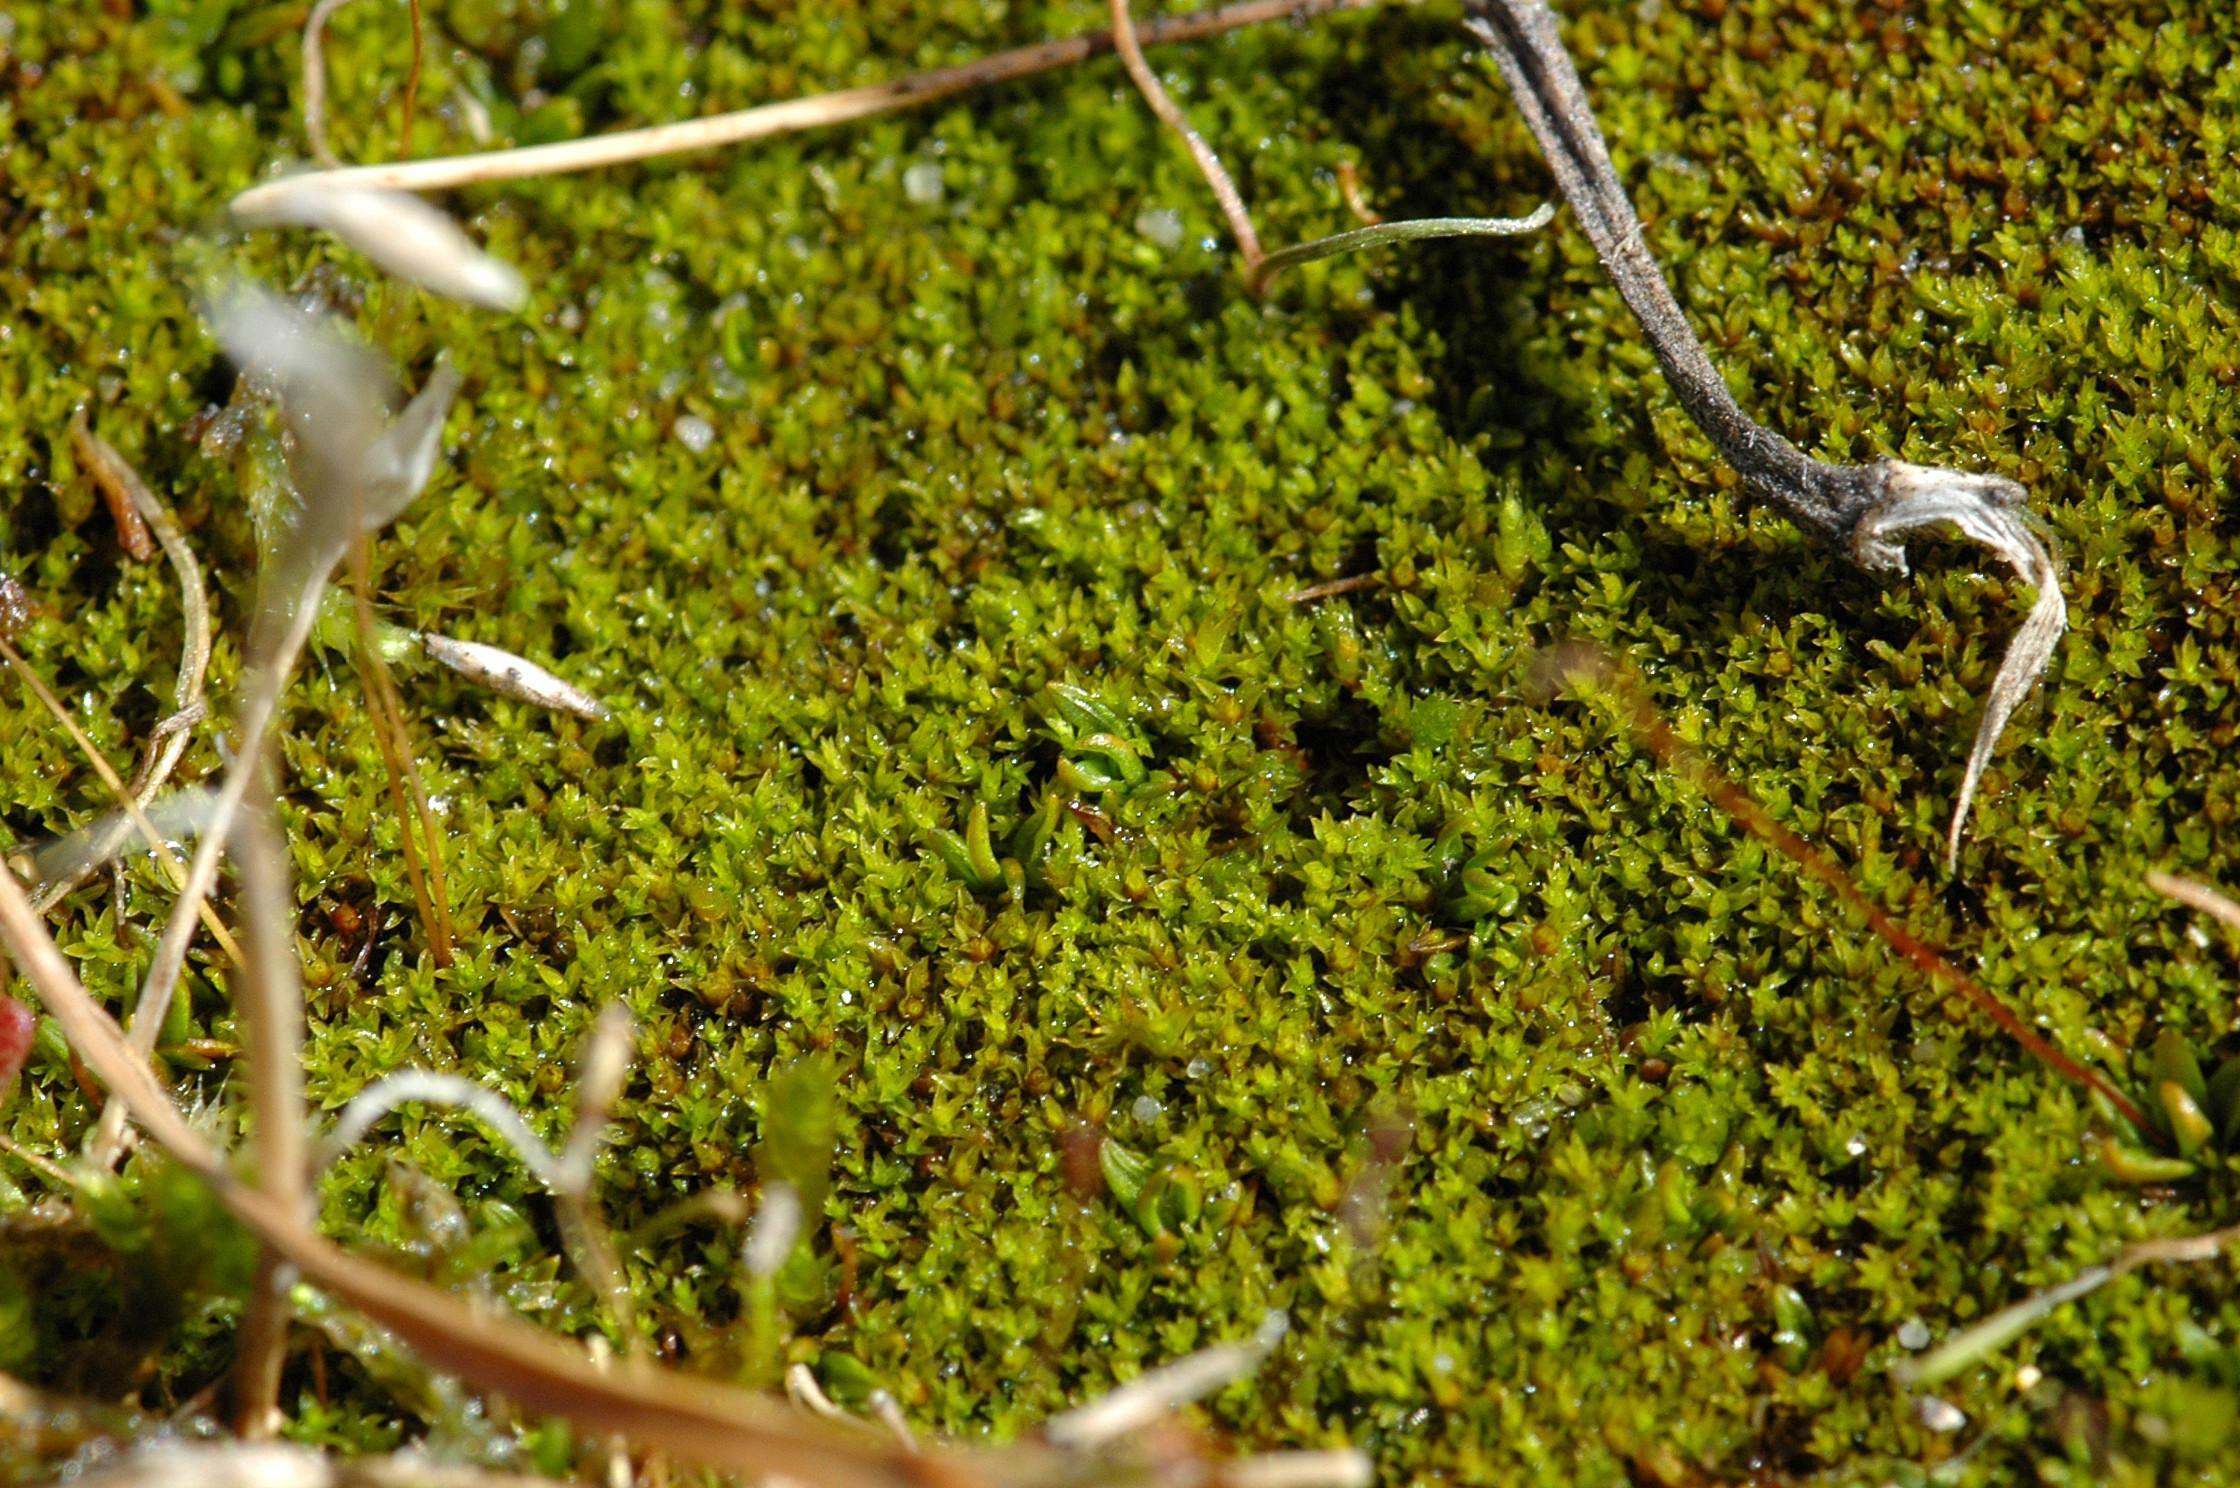 Image of aloina moss